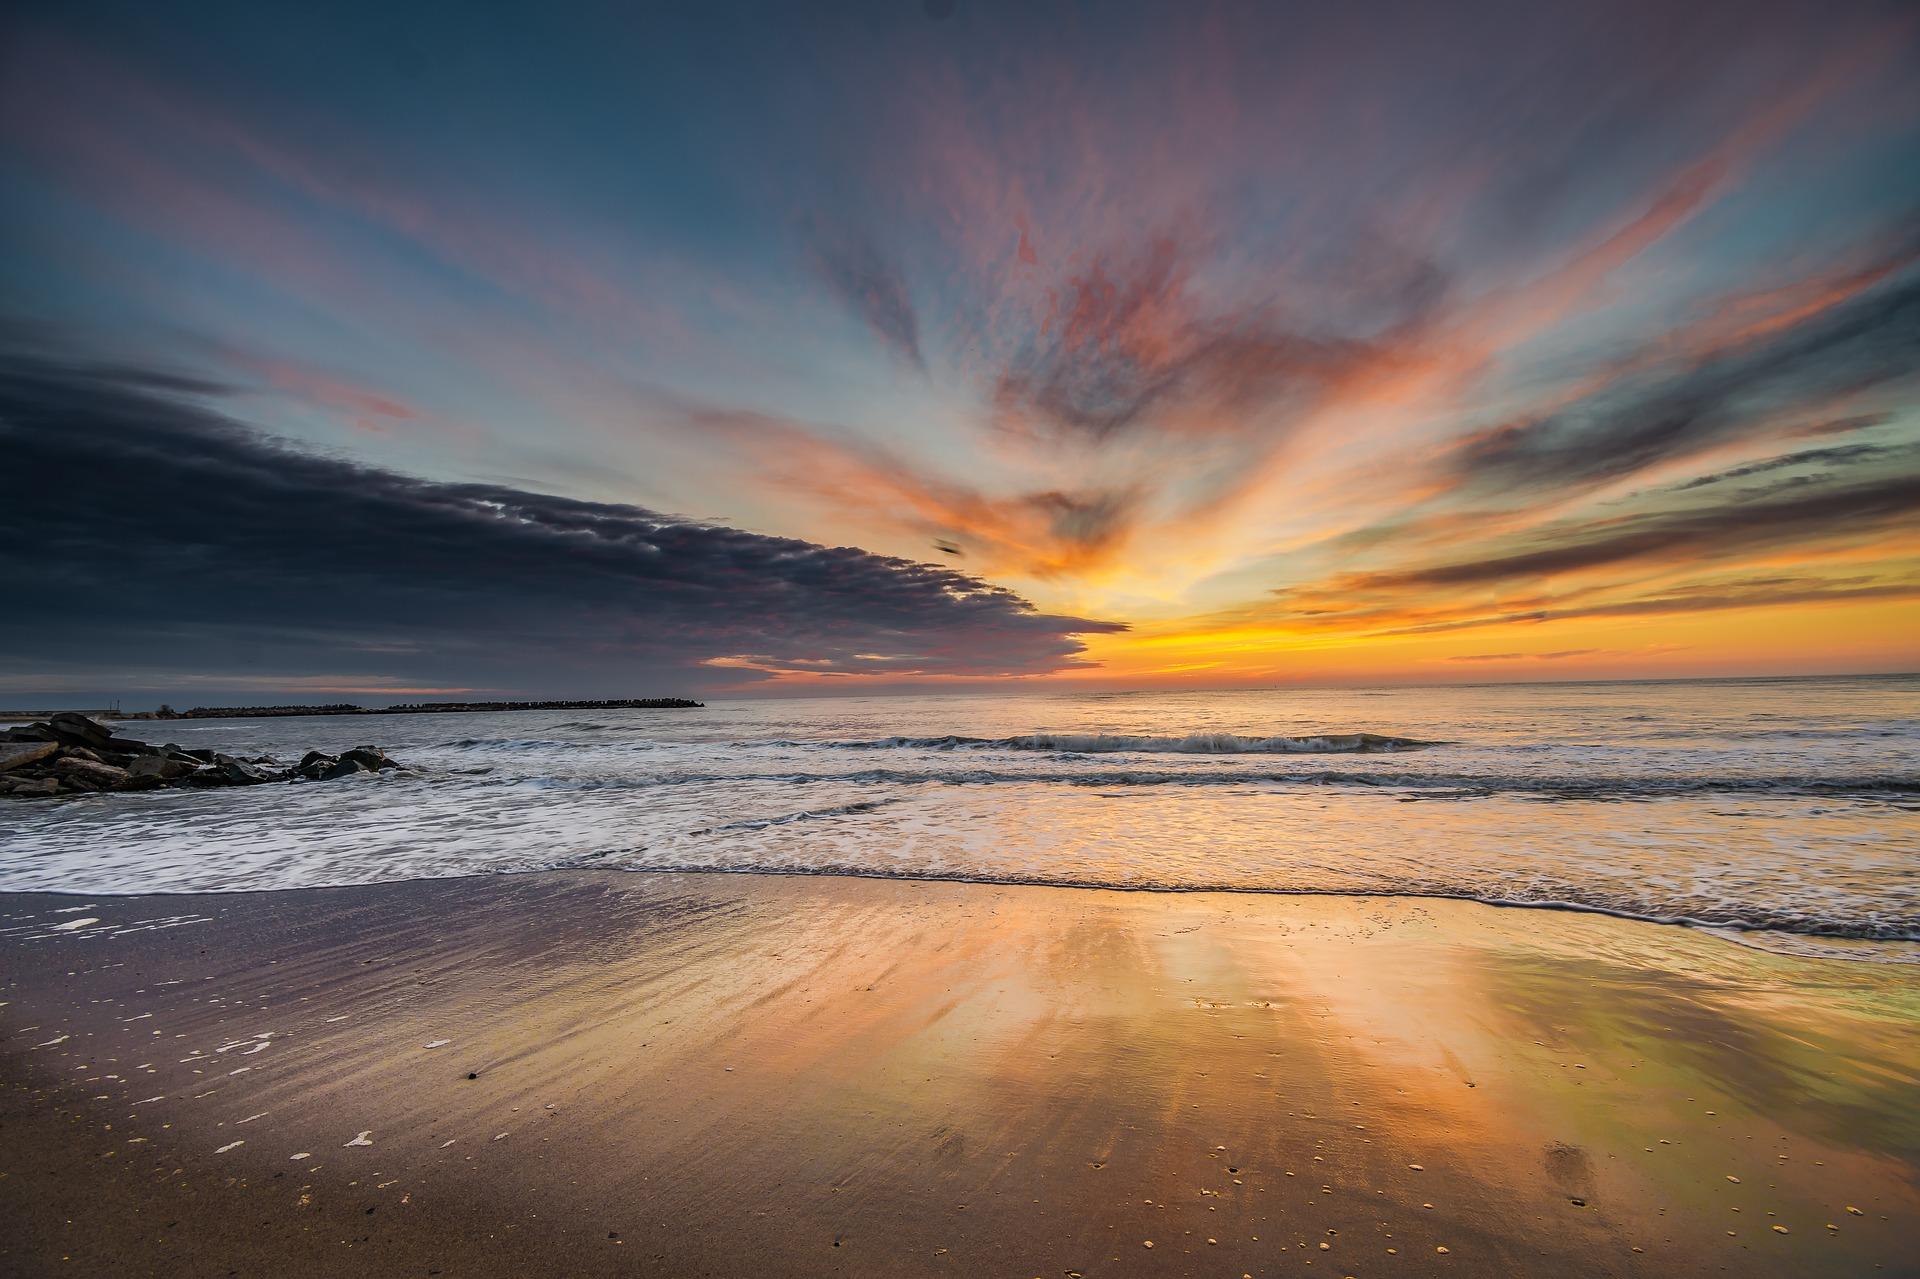 sunset-3258051_1920